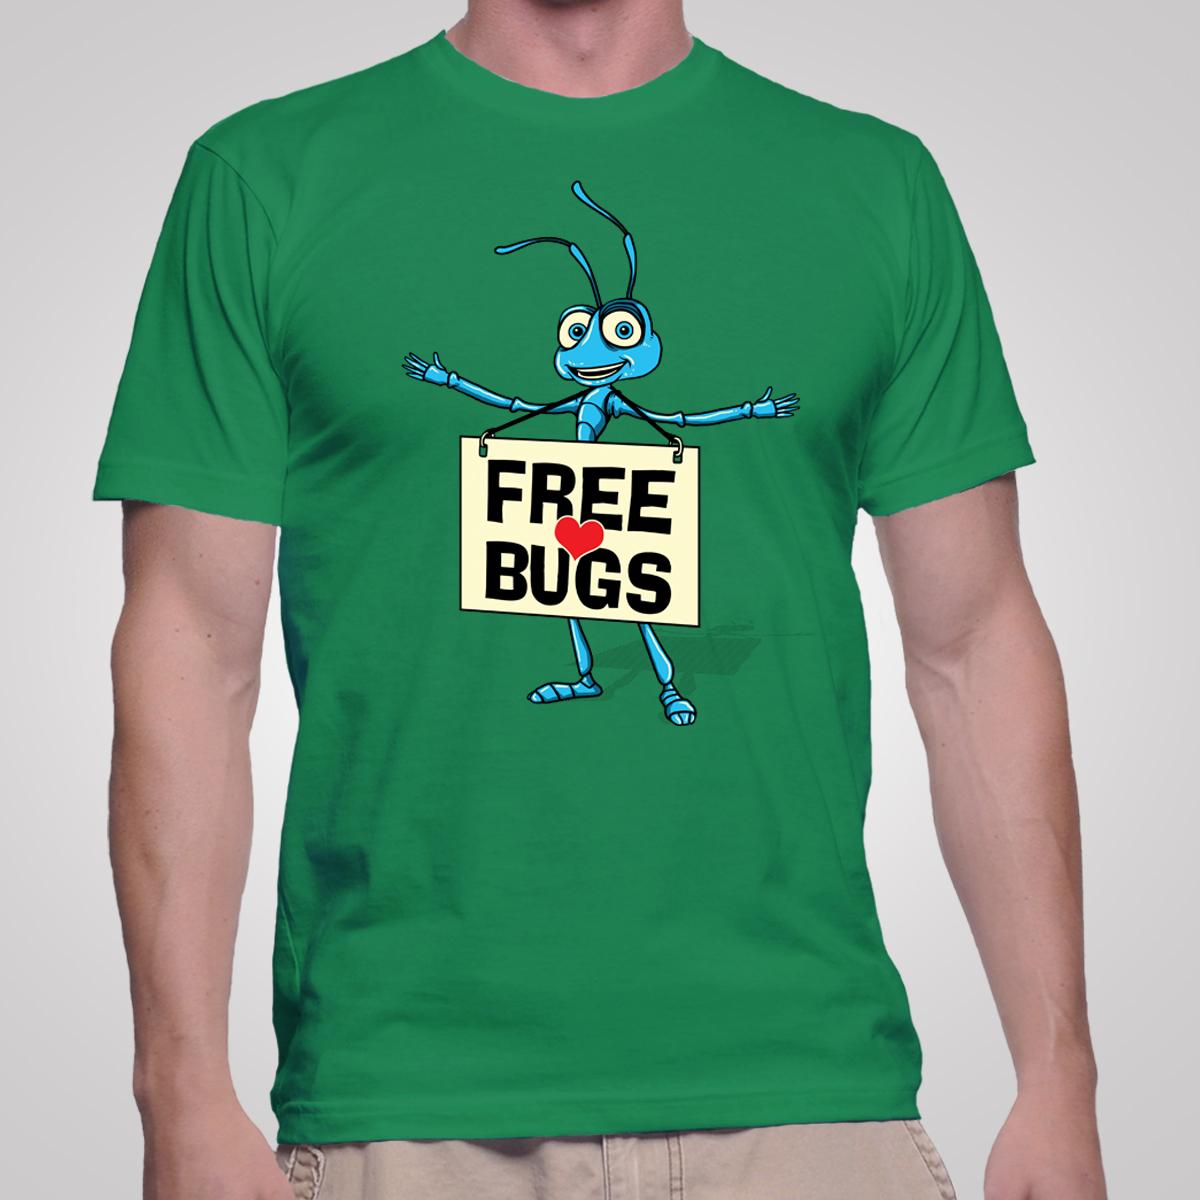 FREE BUGS_IRISH GREEN_guy_mock up